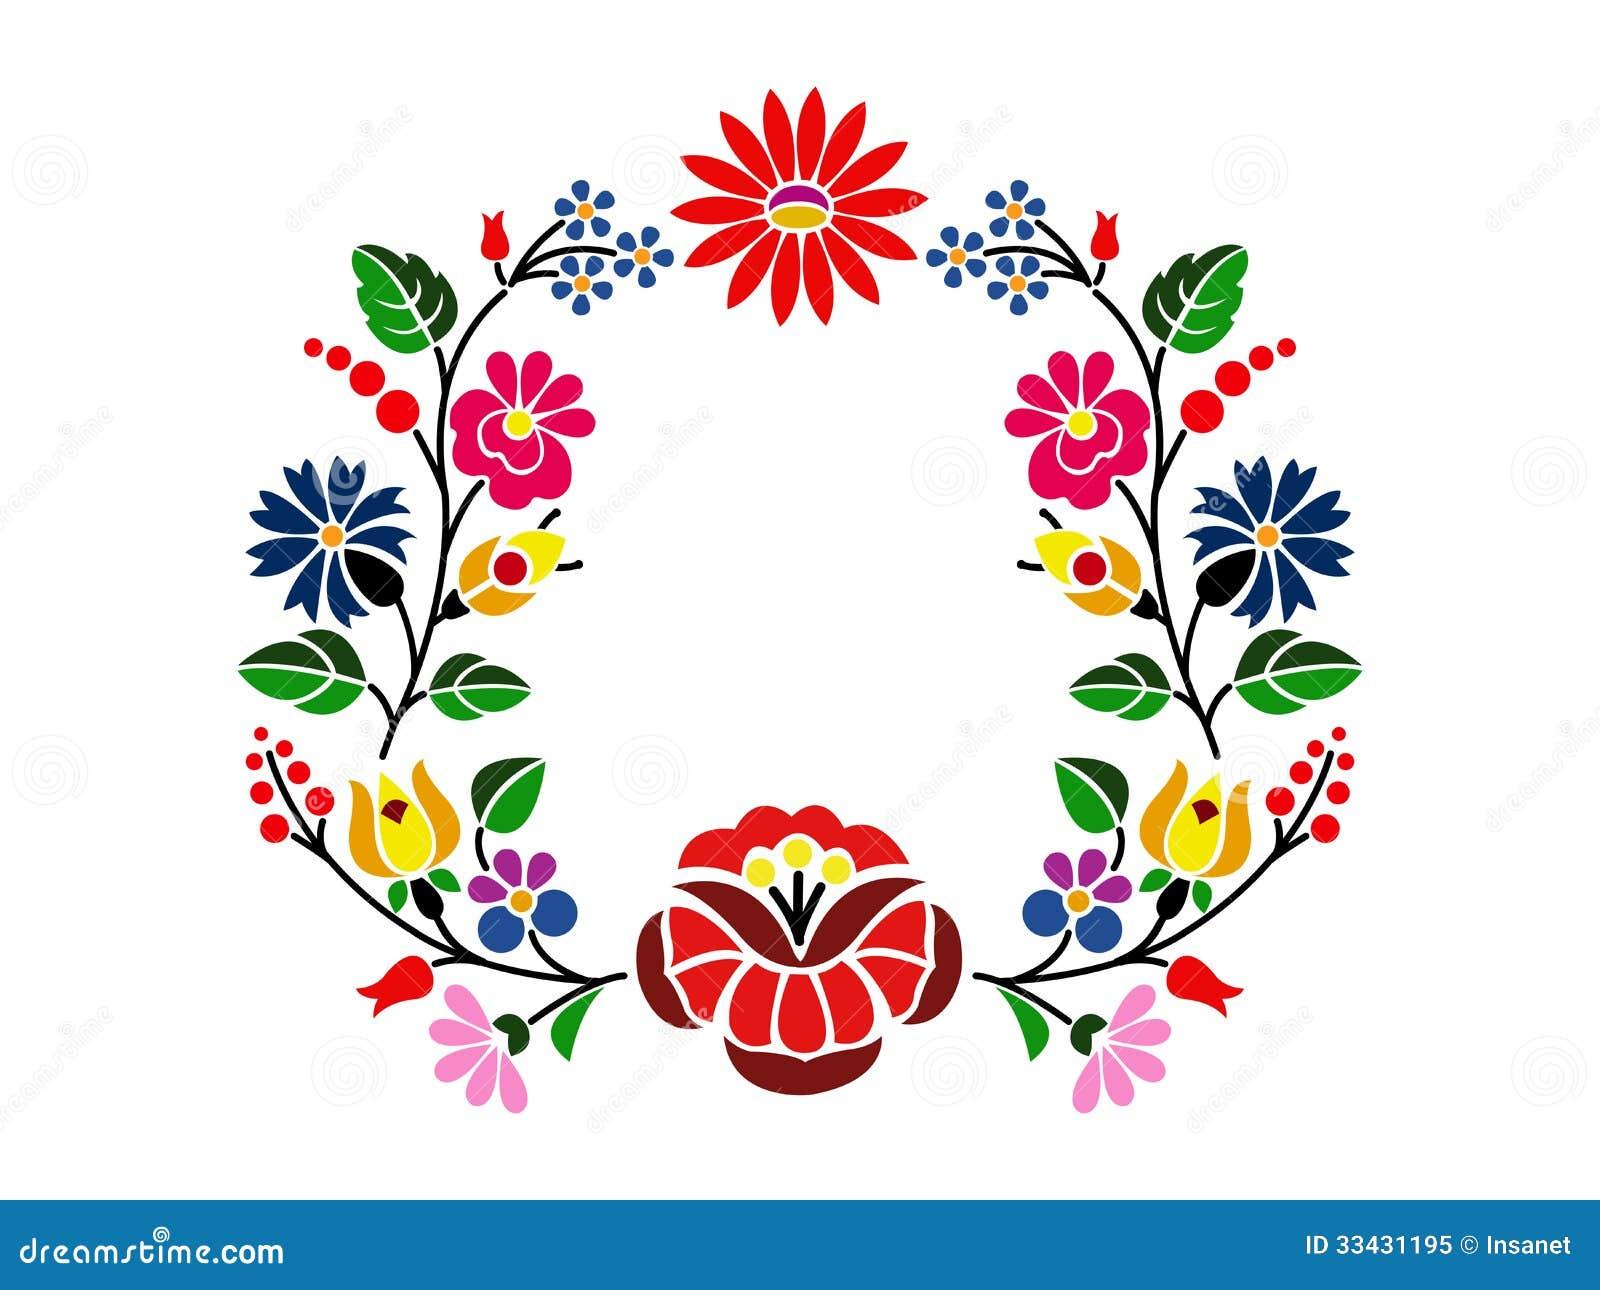 Mexican Bird Embroidery Designs